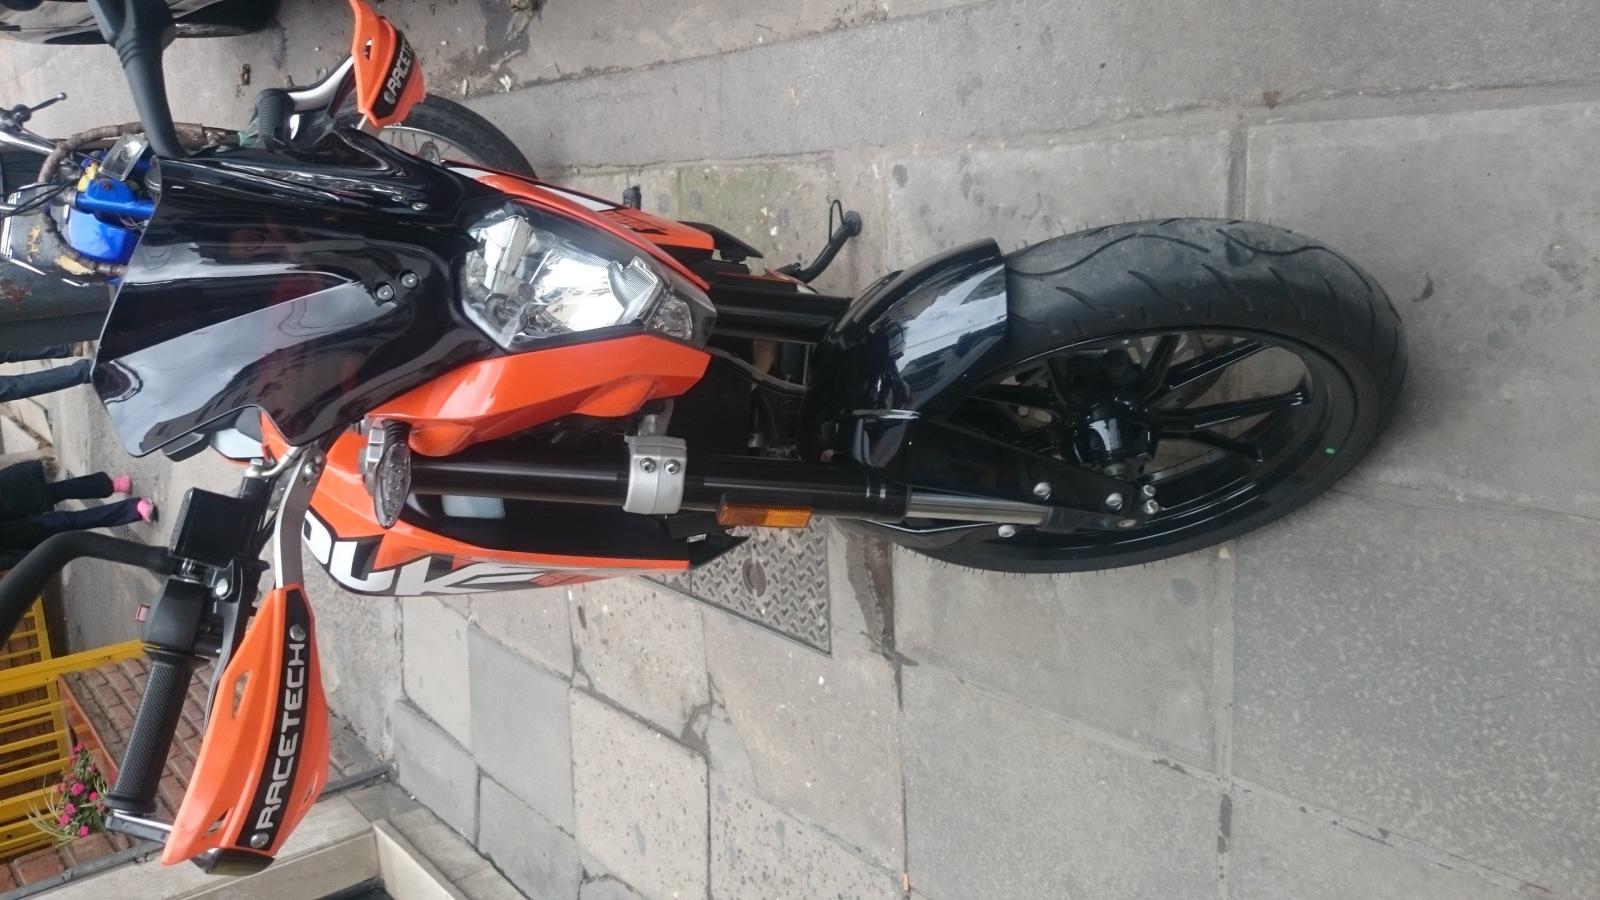 KTM DUKE 200 en argentina - Página 5 29em2b6